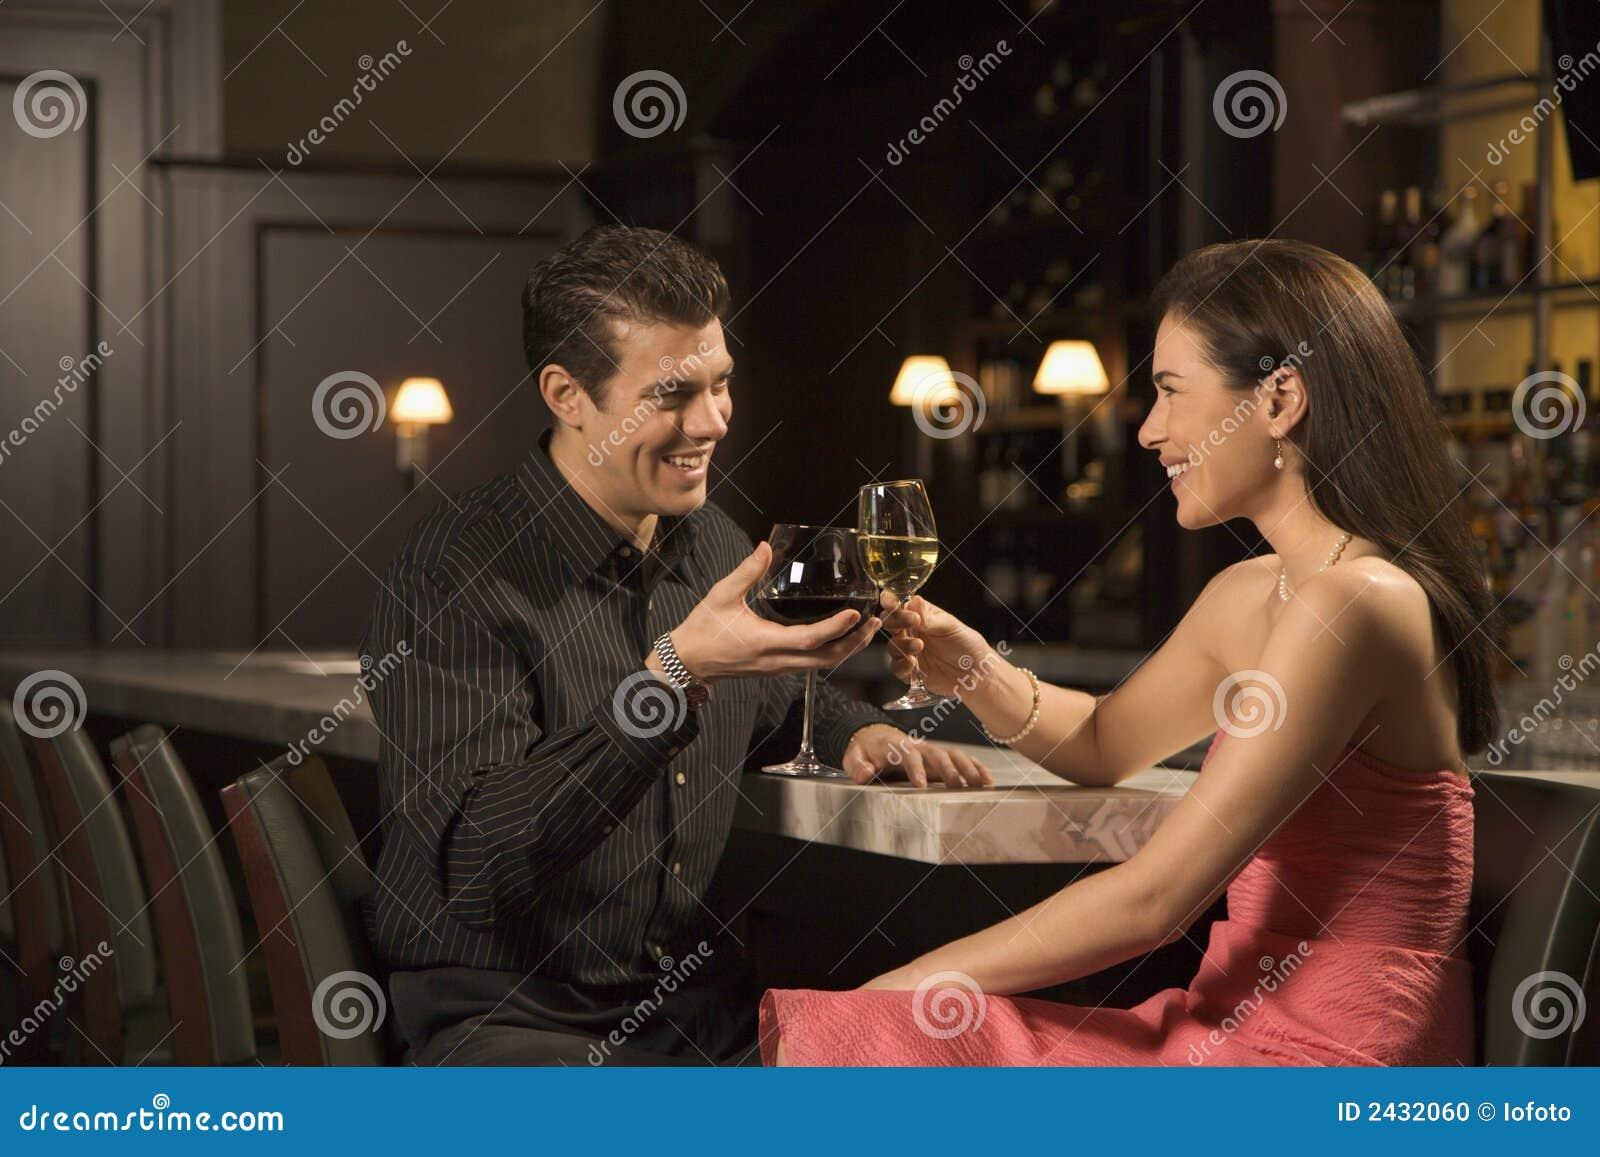 Снял в баре онлайн 16 фотография